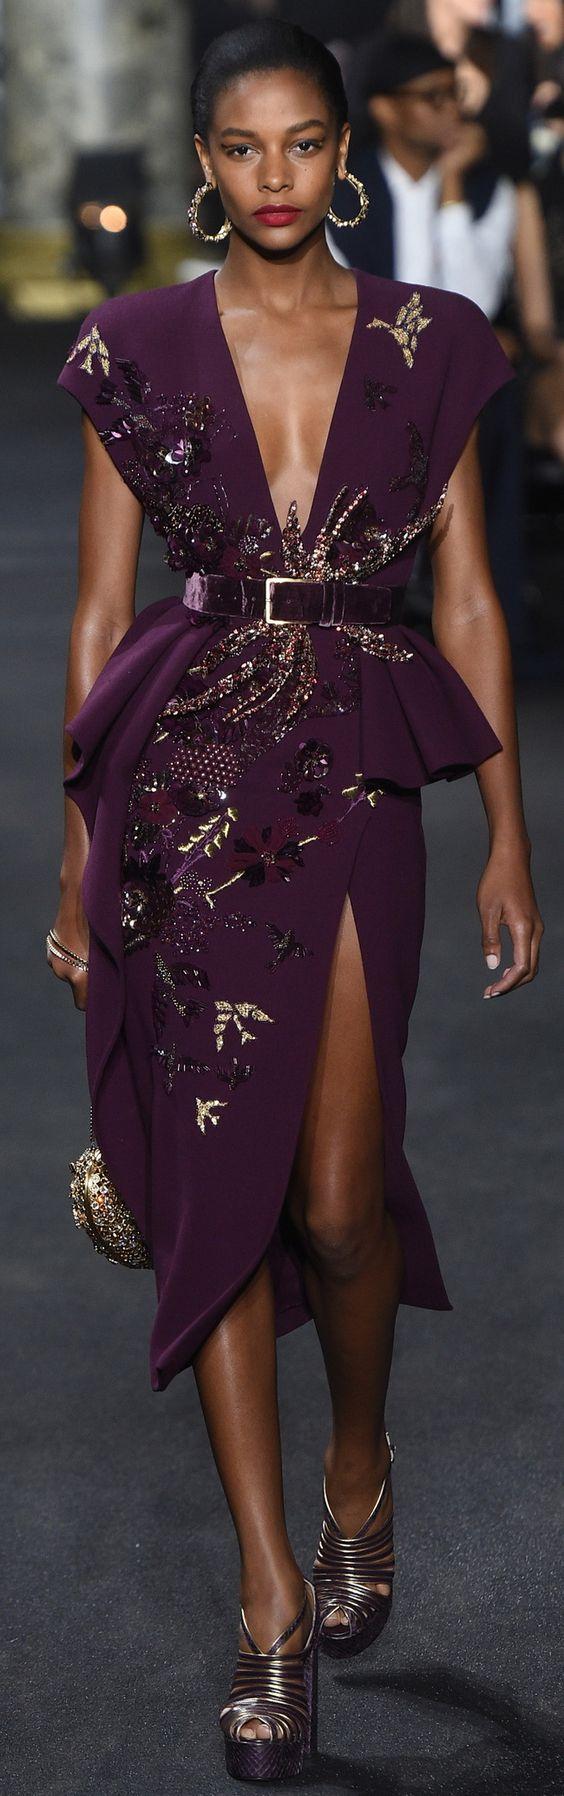 elie-saab-haute-couture-fallwinter-2016-2017